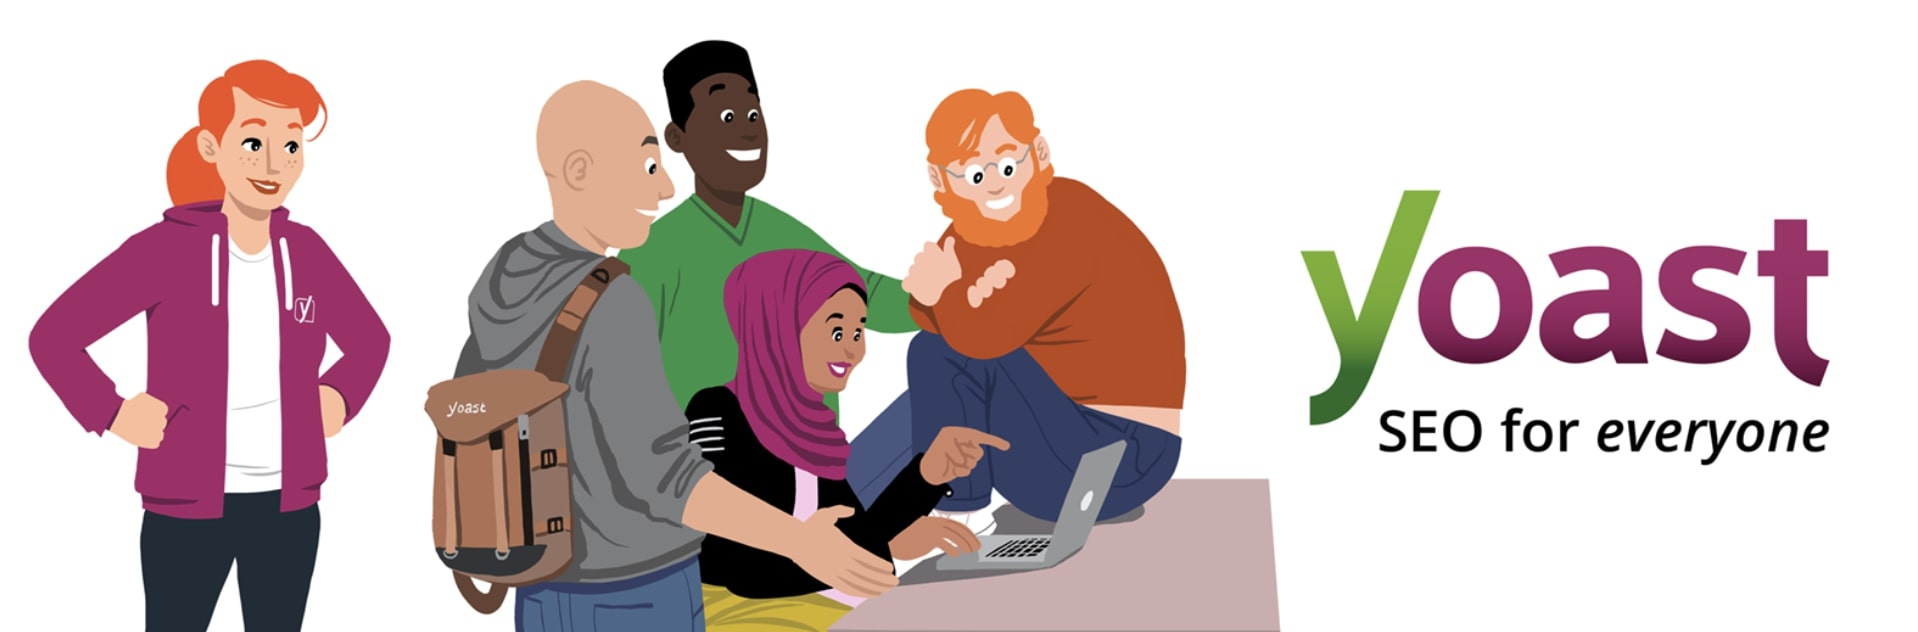 Daftar 15 Plugin Wordpress Wajib Ada di Blog untuk SEO (Edisi 2019) 3